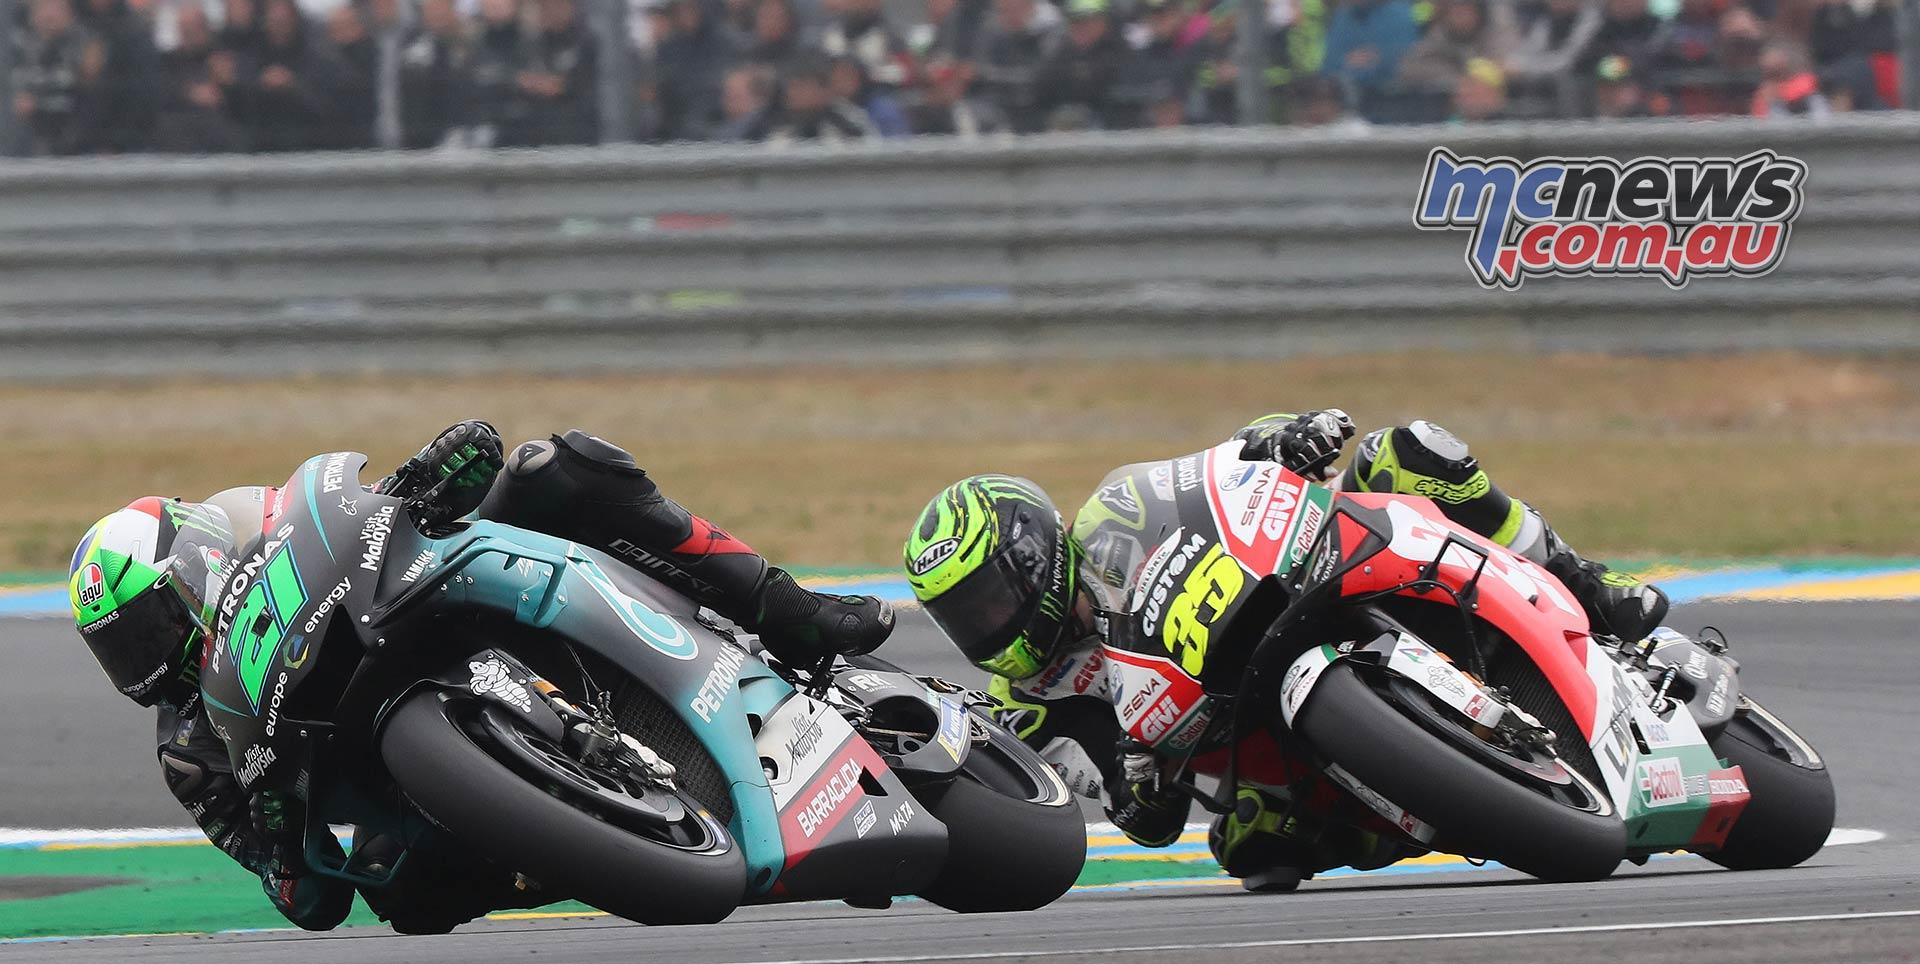 MotoGP Rnd LeMans Morbidelli Crutchlow